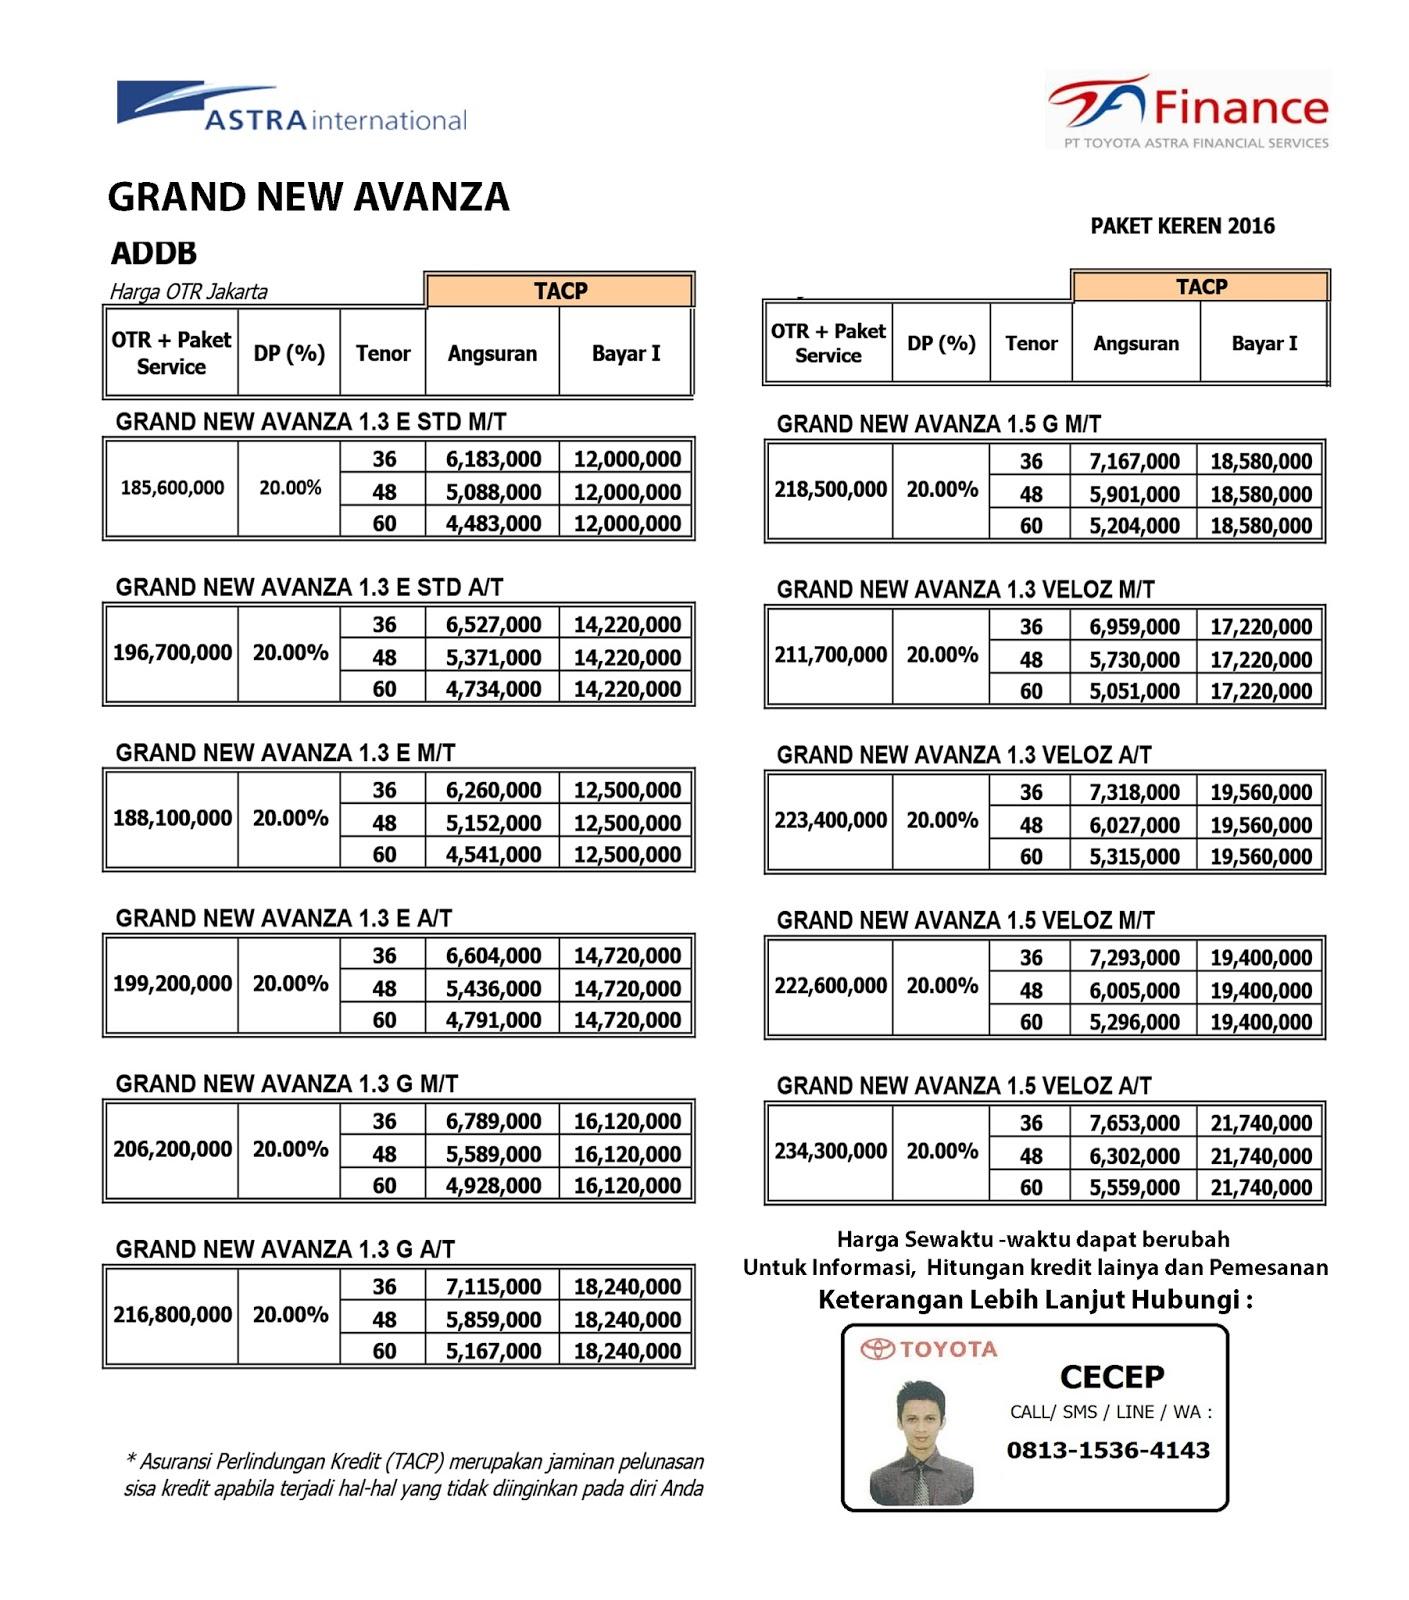 Cicilan Grand New Avanza Harga All 2018 Promo Merdeka Paket Keren Dp Murah Toyota Lippo Cikarang Kredit Per Agustus Mulai Dari 12 Juta